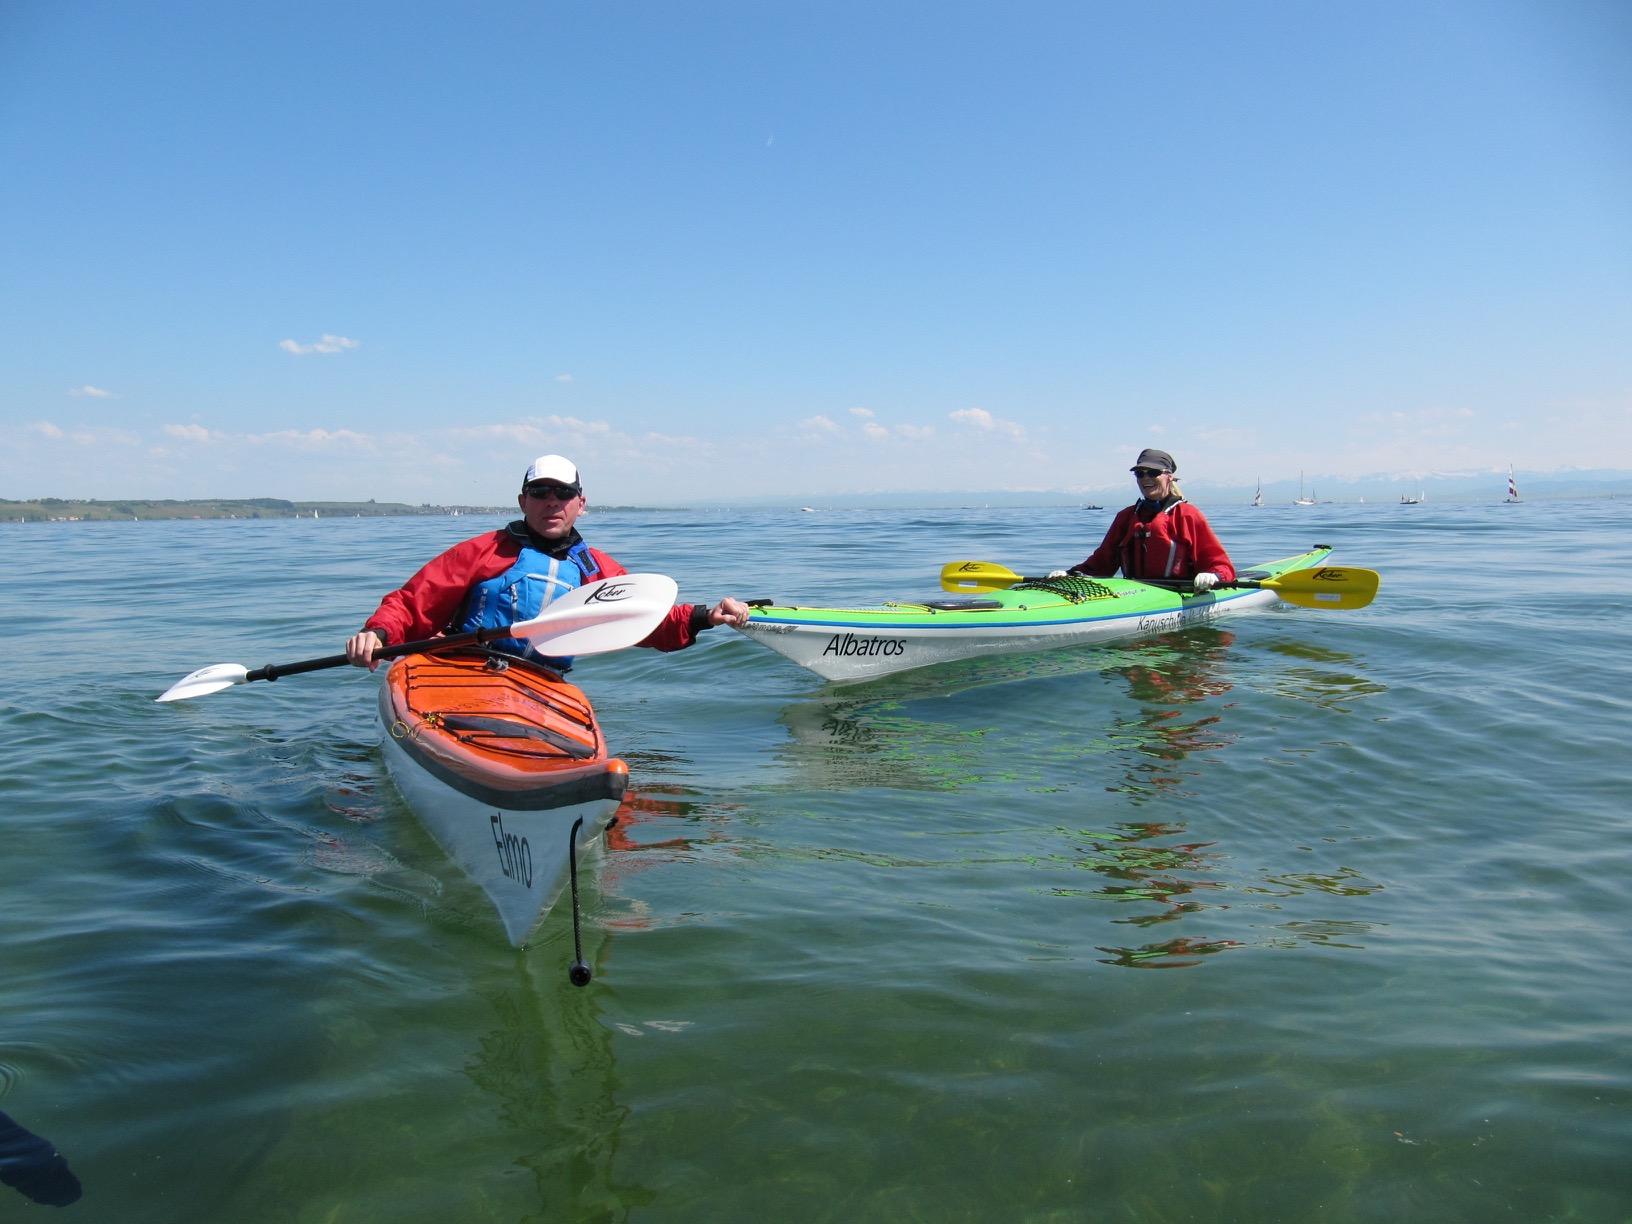 Kajakkurs Bodensee Konstanz beim Paddelprofi